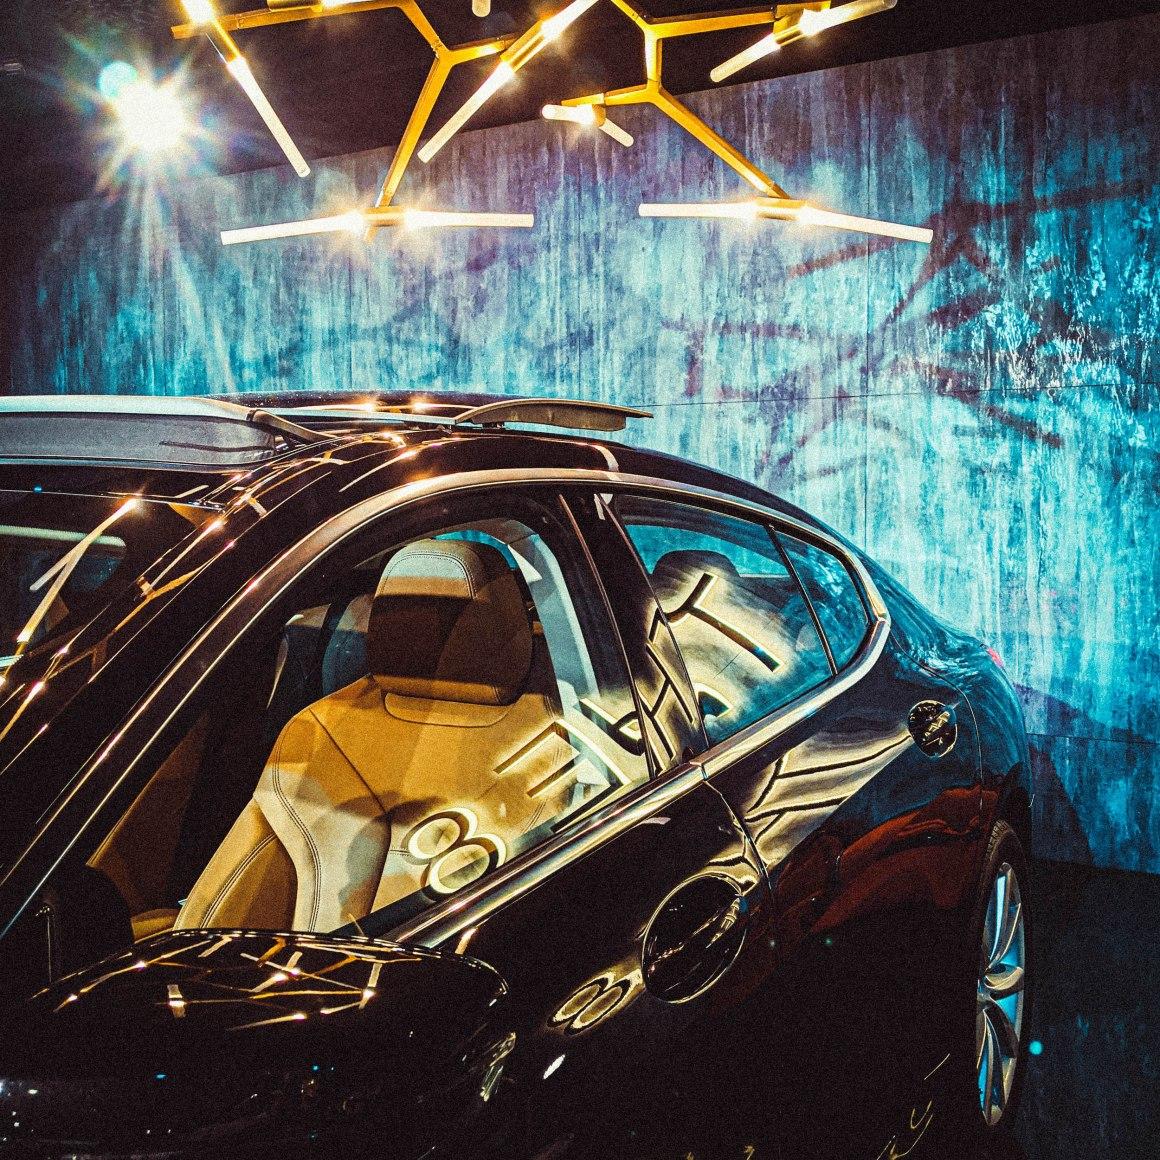 bmw, eyesforluxury, automobiles, automobile brand, bayerische motoren werke ag, german company, german automobile, bmw 8 series gran coupe, the8, luxury grand tourer, four door, thegentlemanconnoisseur, nainaxbmw, india art fair, bmw at the india art fair, bmwatiaf, indiaartfair2020, new delhi, lifestyle photographer, luxury photographer, car, automobile photographer, art photographer, art fair, naina redhu, naina, naina.co